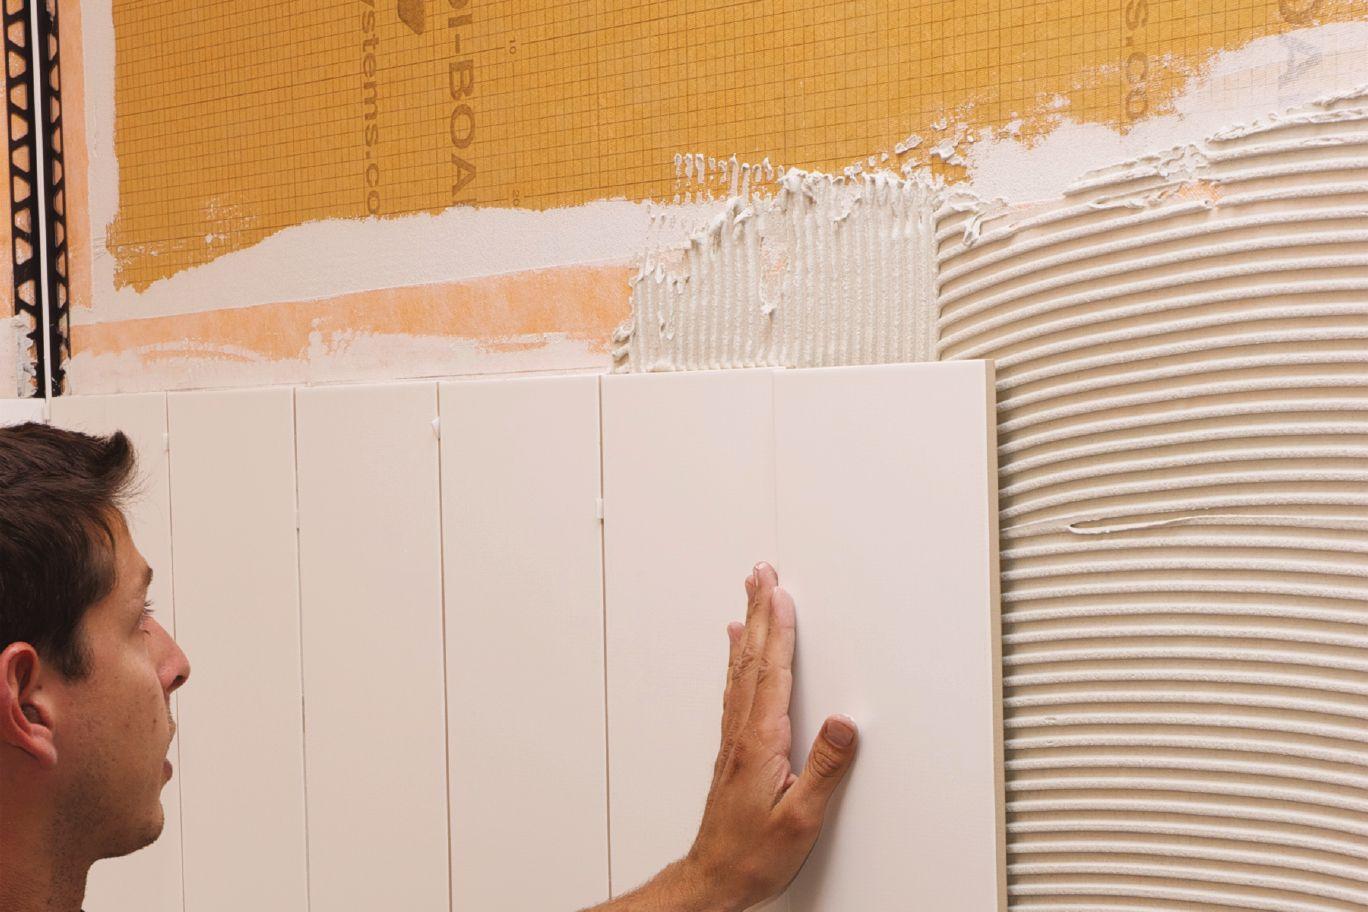 Schluter Kerdi Board Kerdi Board Panels Building Panels throughout dimensions 1368 X 912